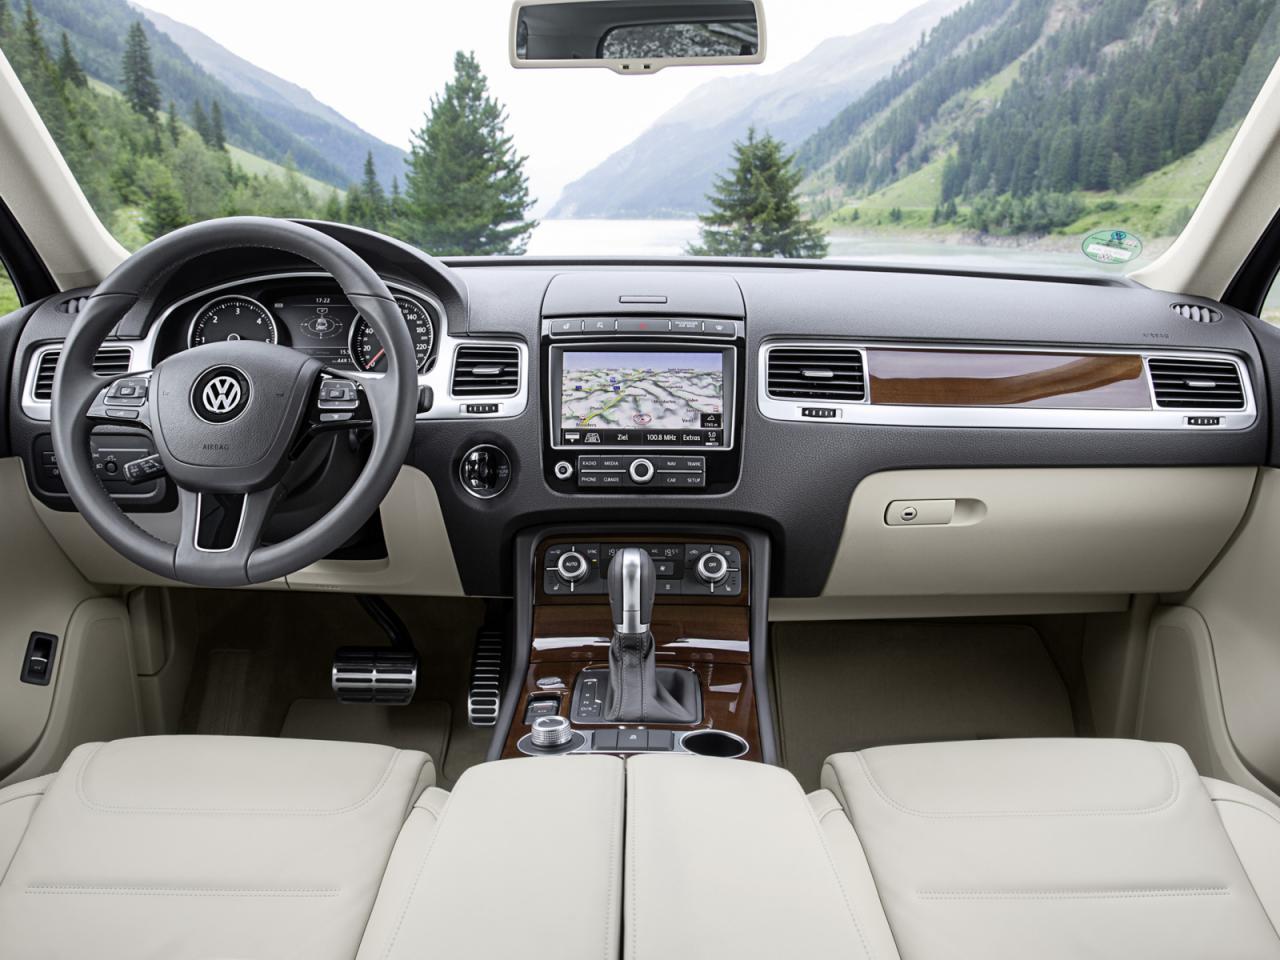 2015 Volkswagen Touareg V6 TDI gets mild power boost ...